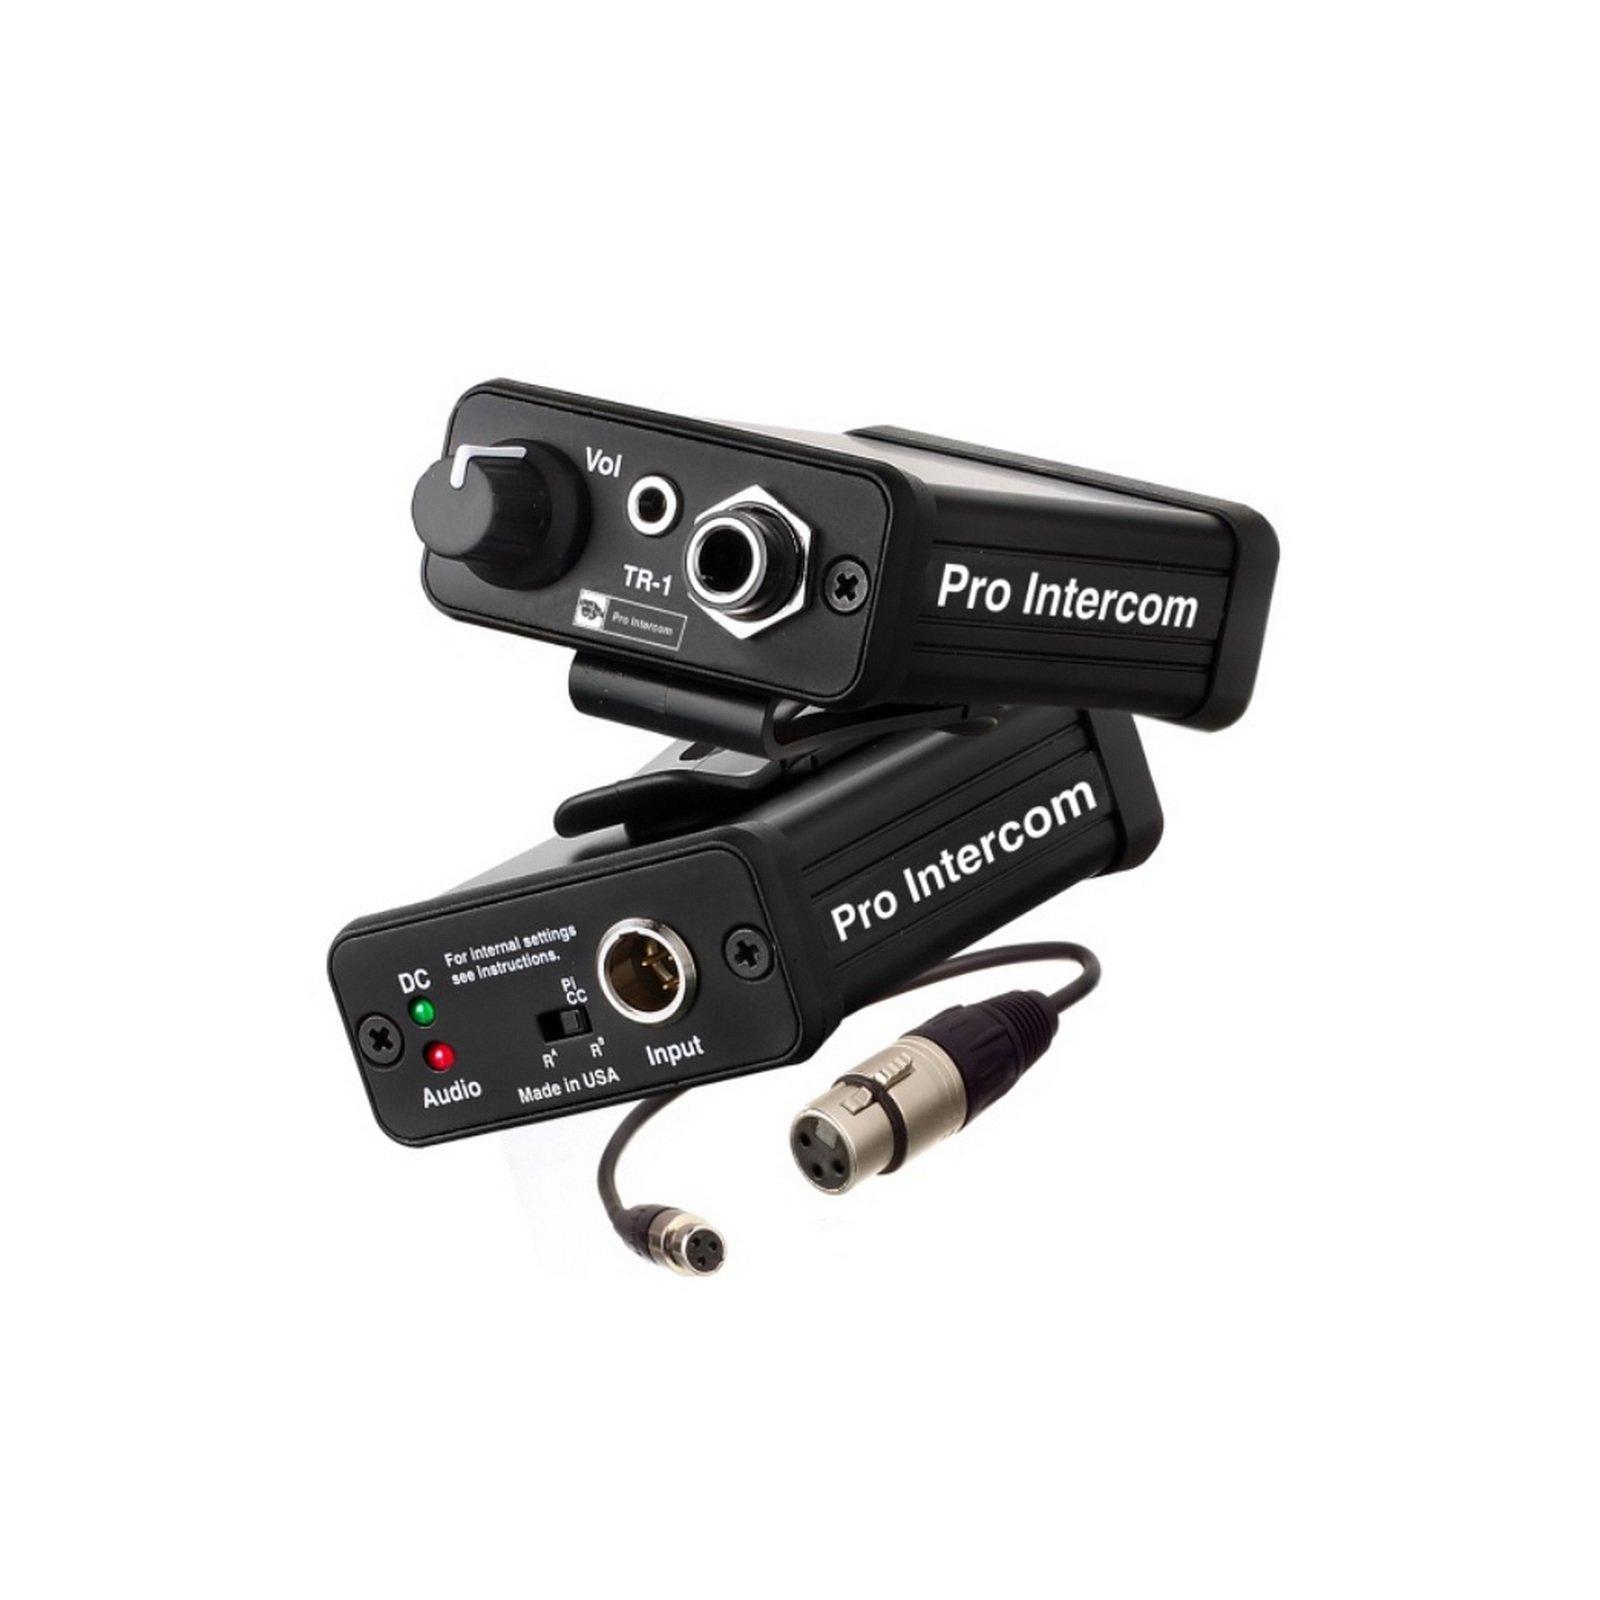 Pro Intercom TR1   Plug IFB Circuit Talent Receiver by Pro Intercom